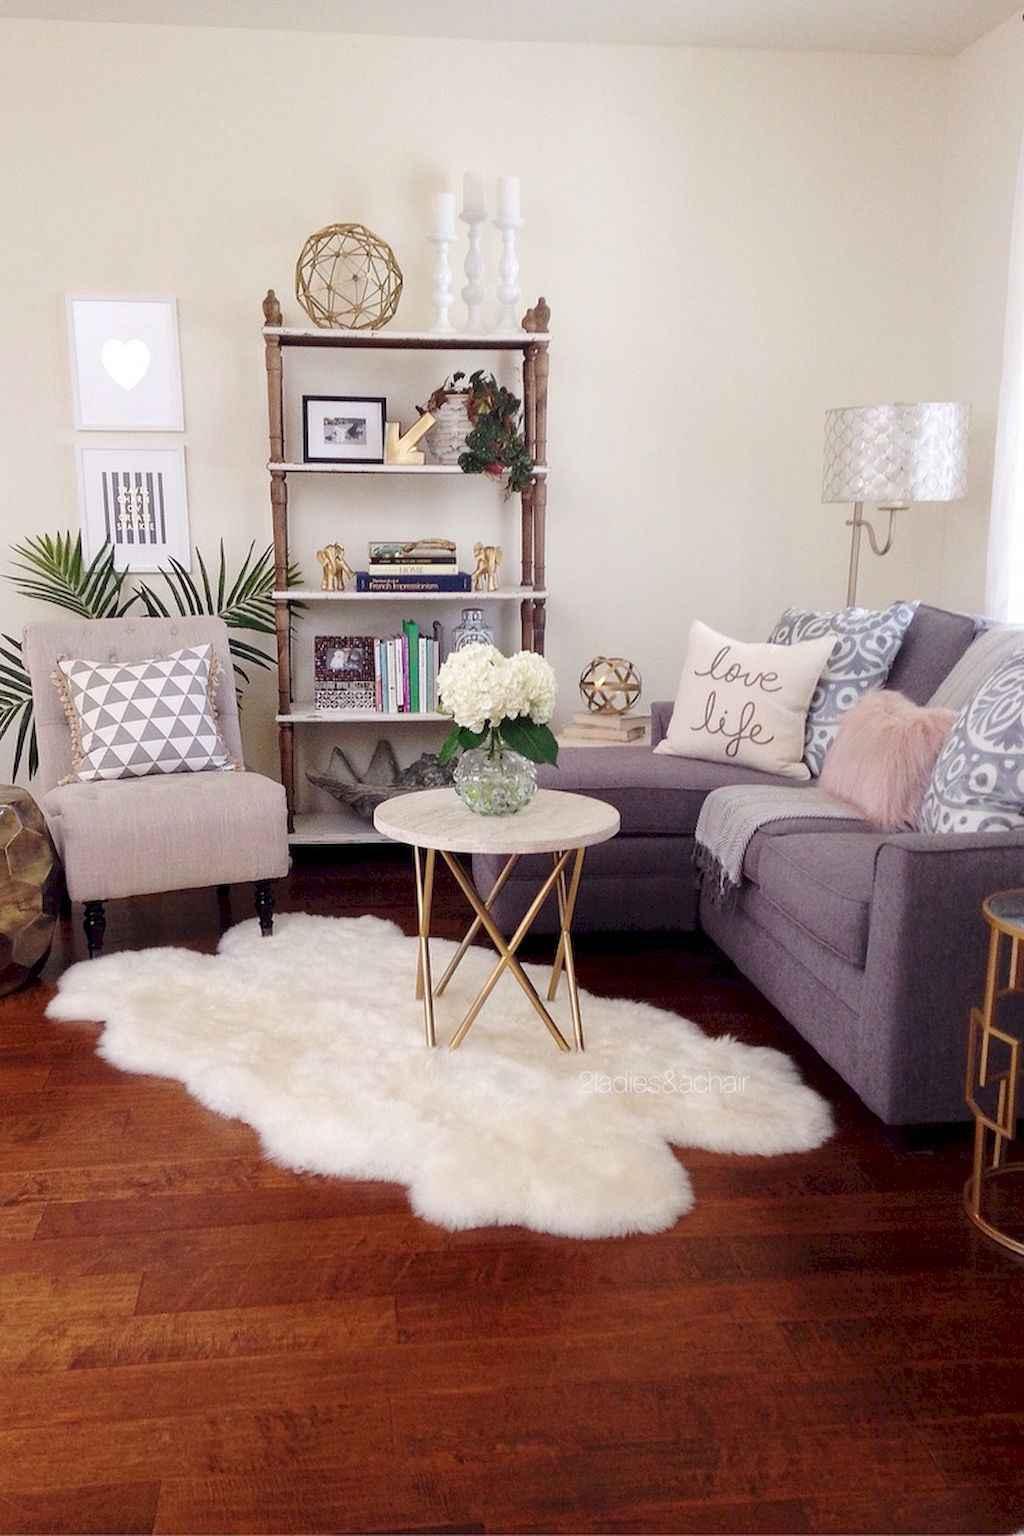 Small apartment decorating ideas (60)